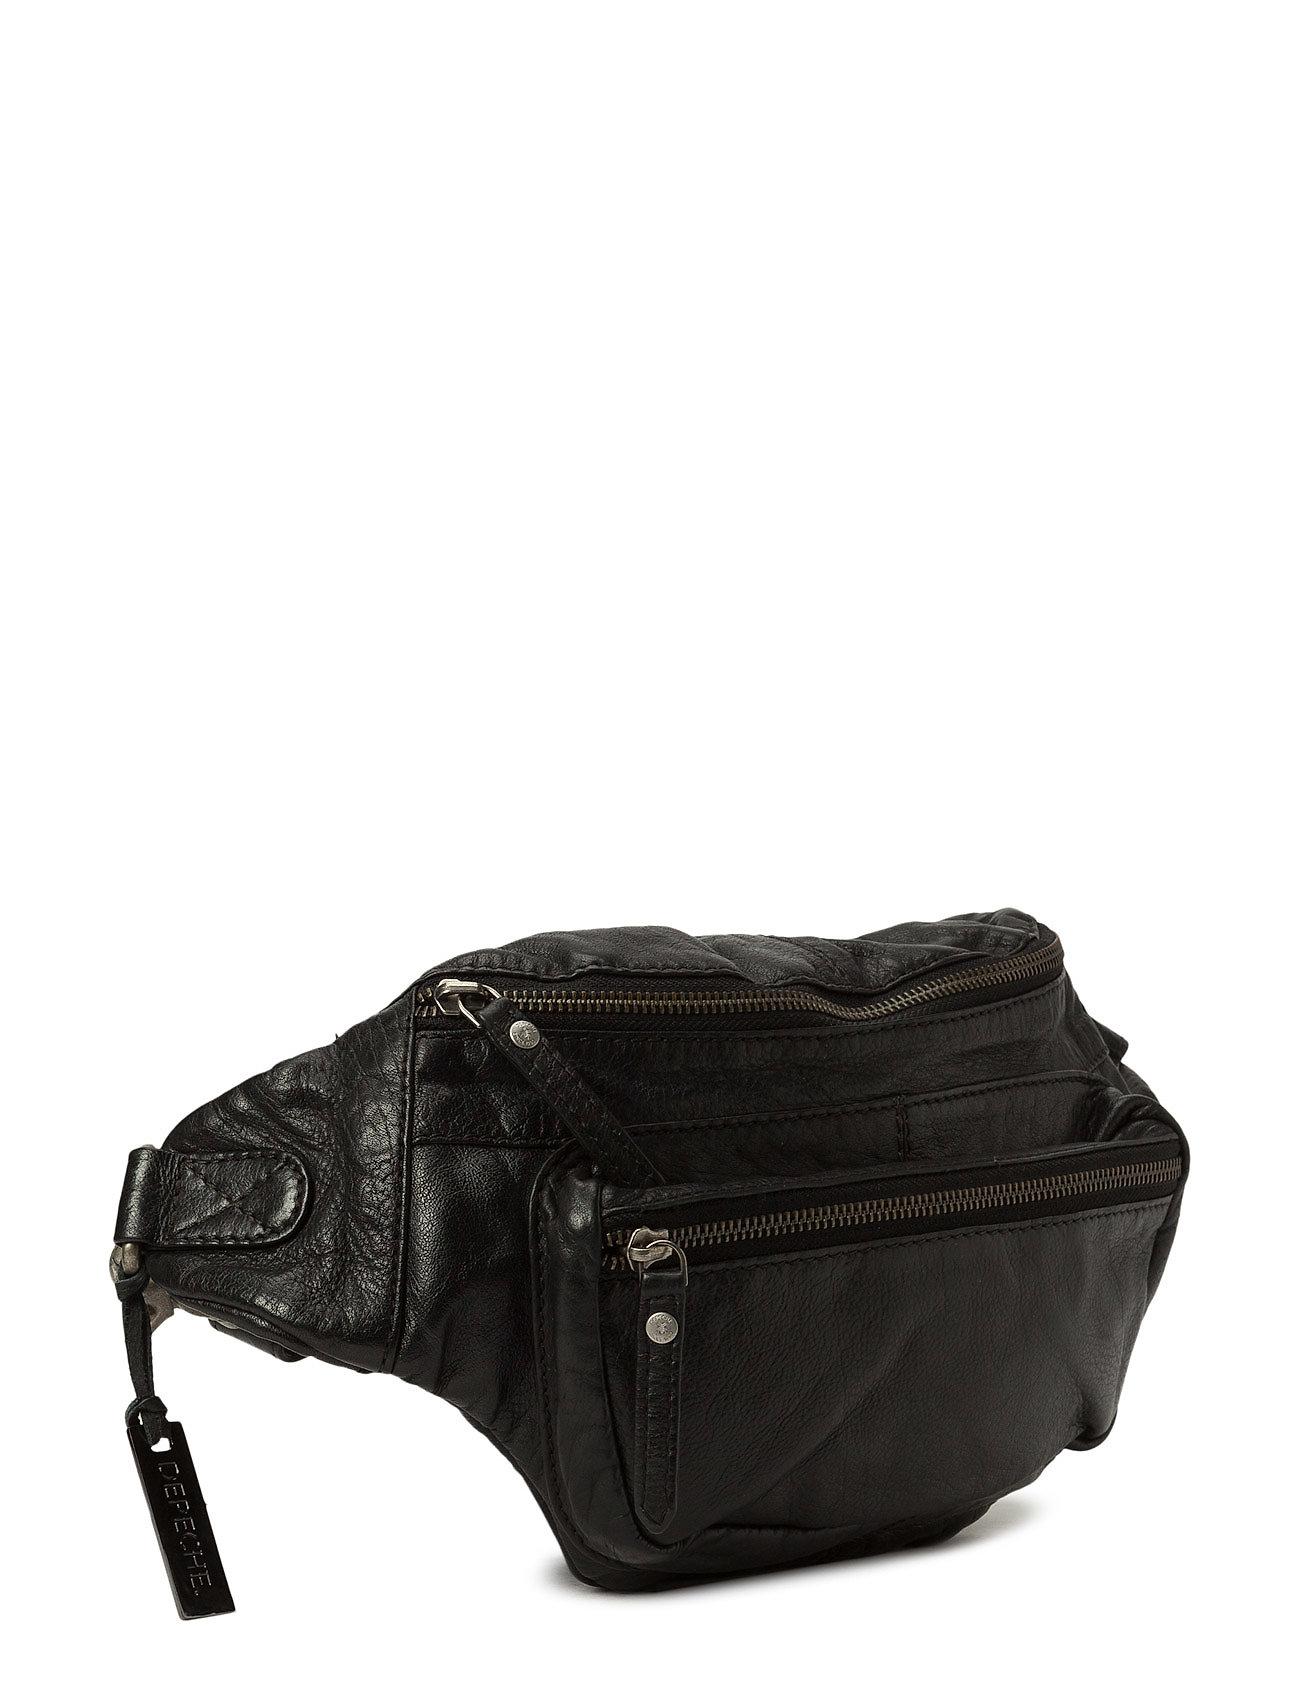 Bag Bag B10354blackDepeche Bag Bag Bum B10354blackDepeche Bum Bum Bum Bag B10354blackDepeche Bum B10354blackDepeche B10354blackDepeche Bum XOikZuPT